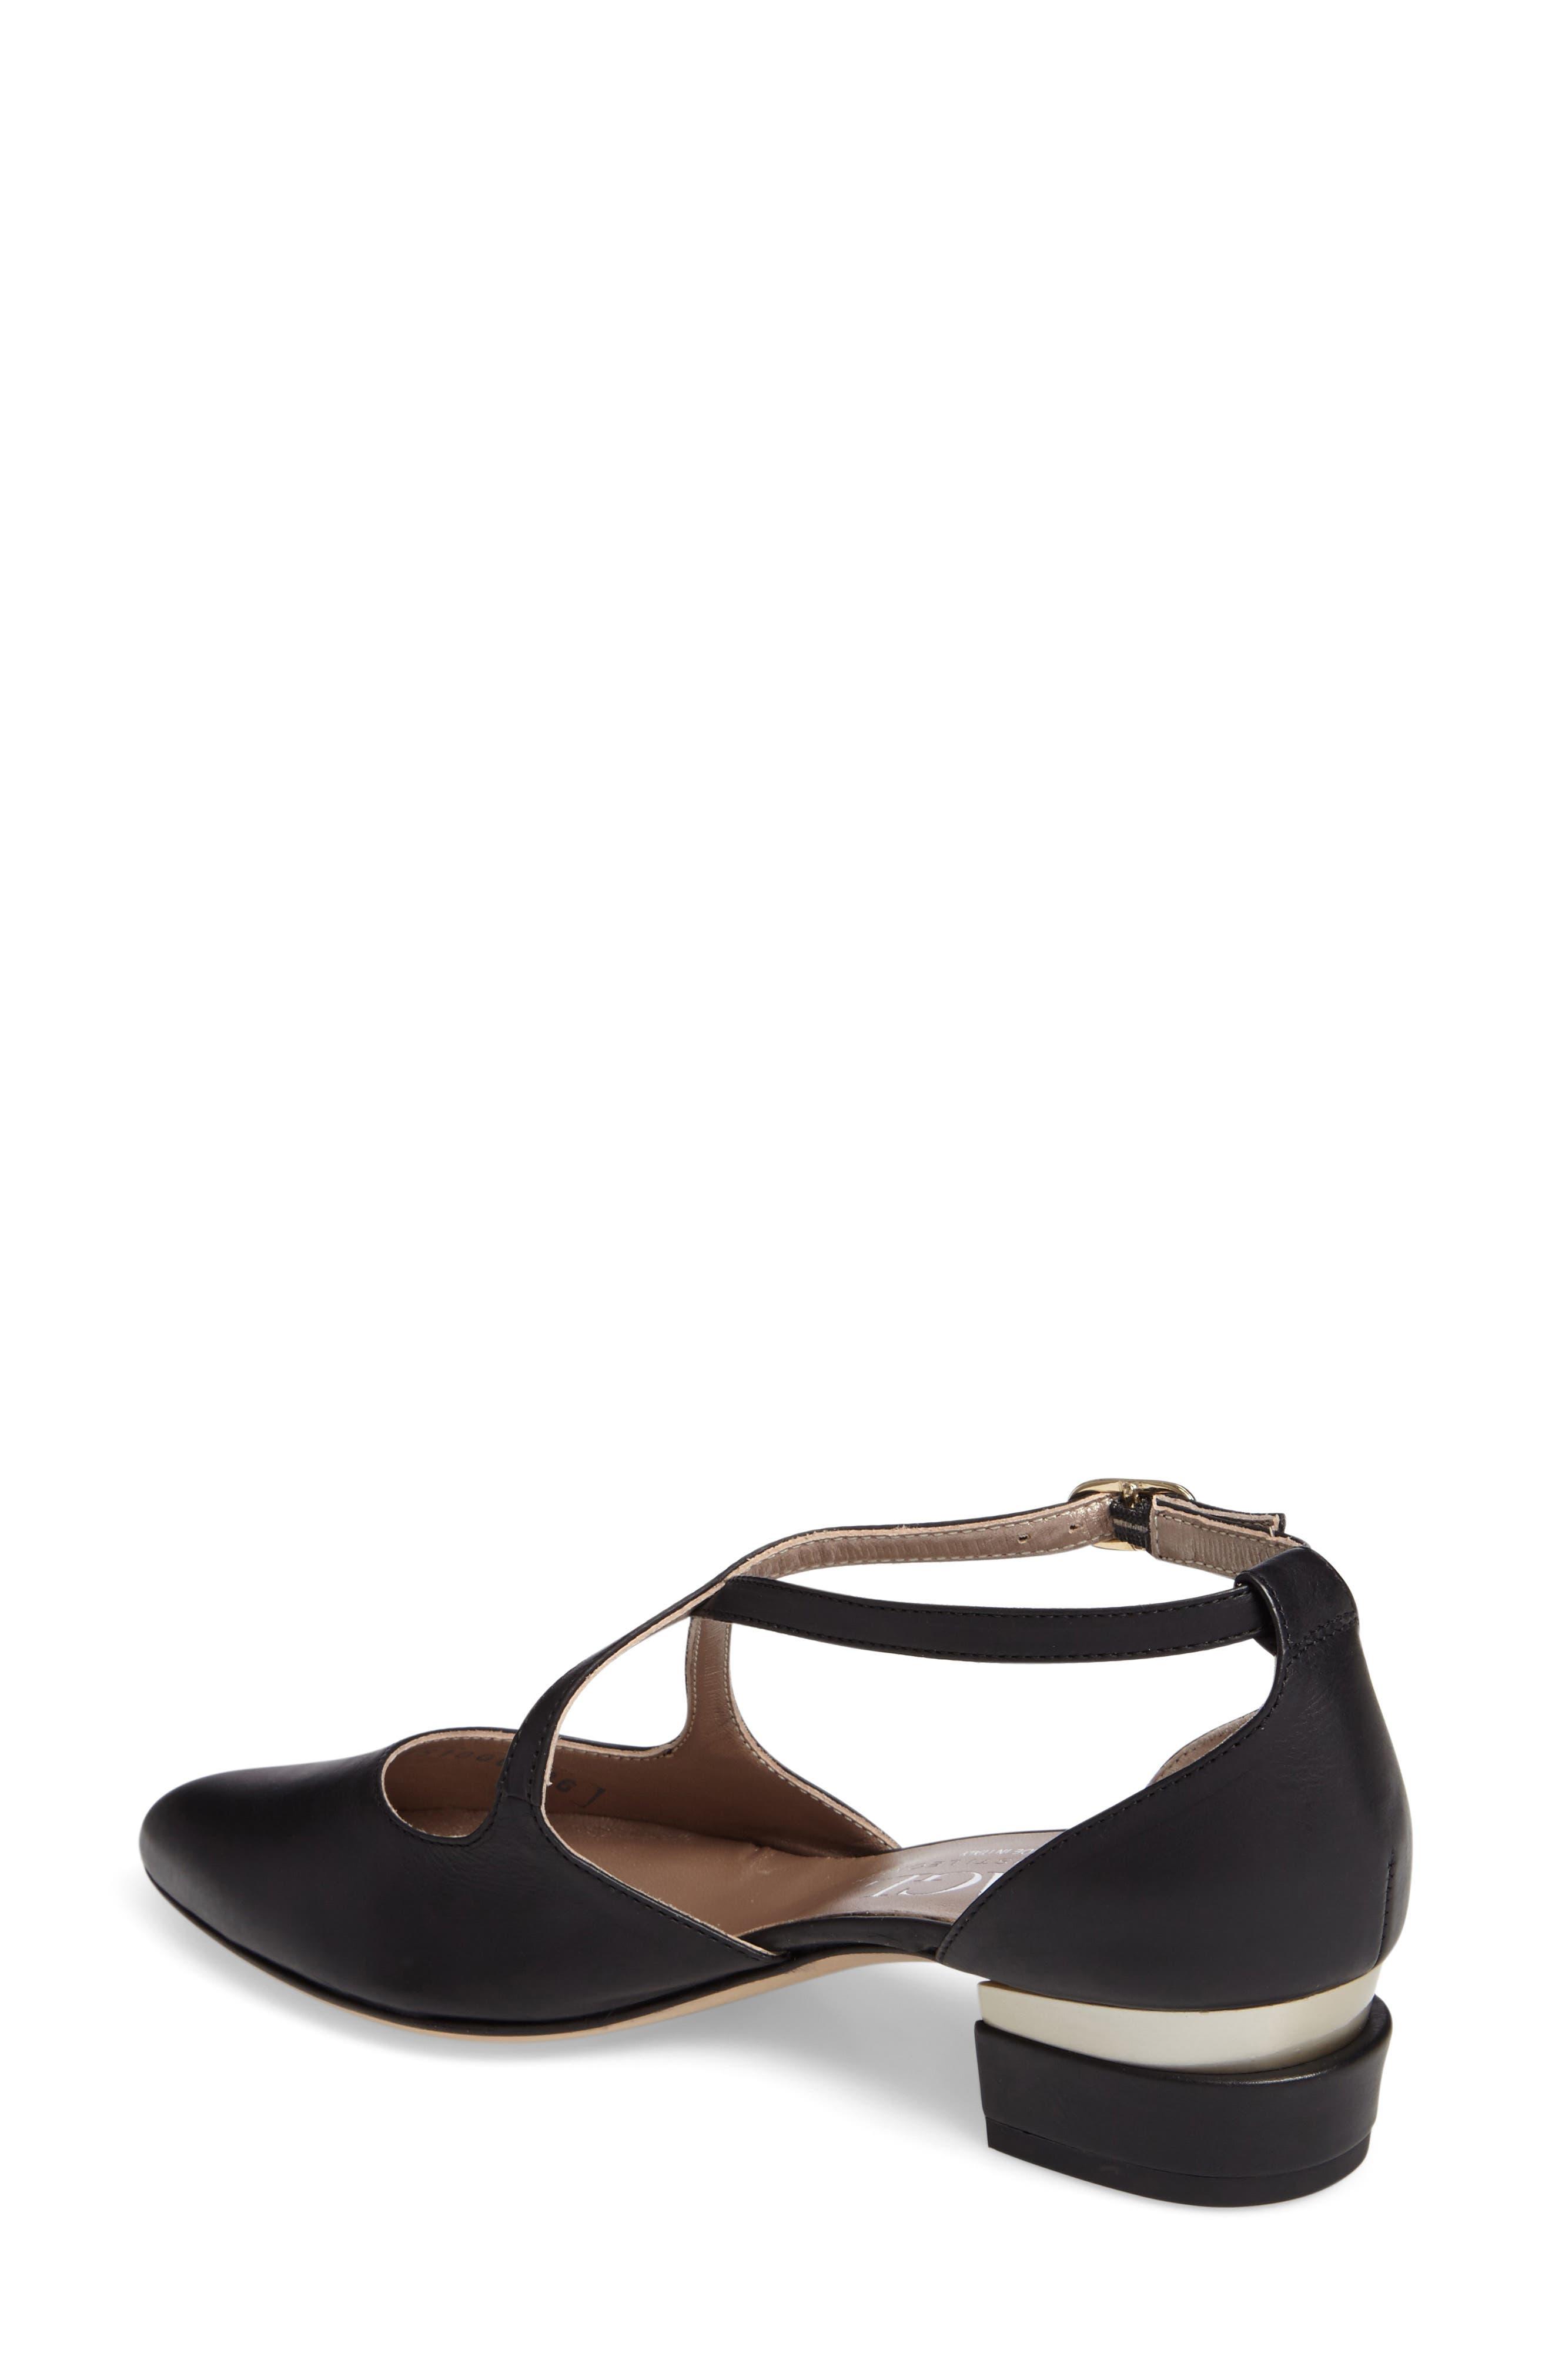 Split Heel d'Orsay Pump,                             Alternate thumbnail 2, color,                             Black Leather